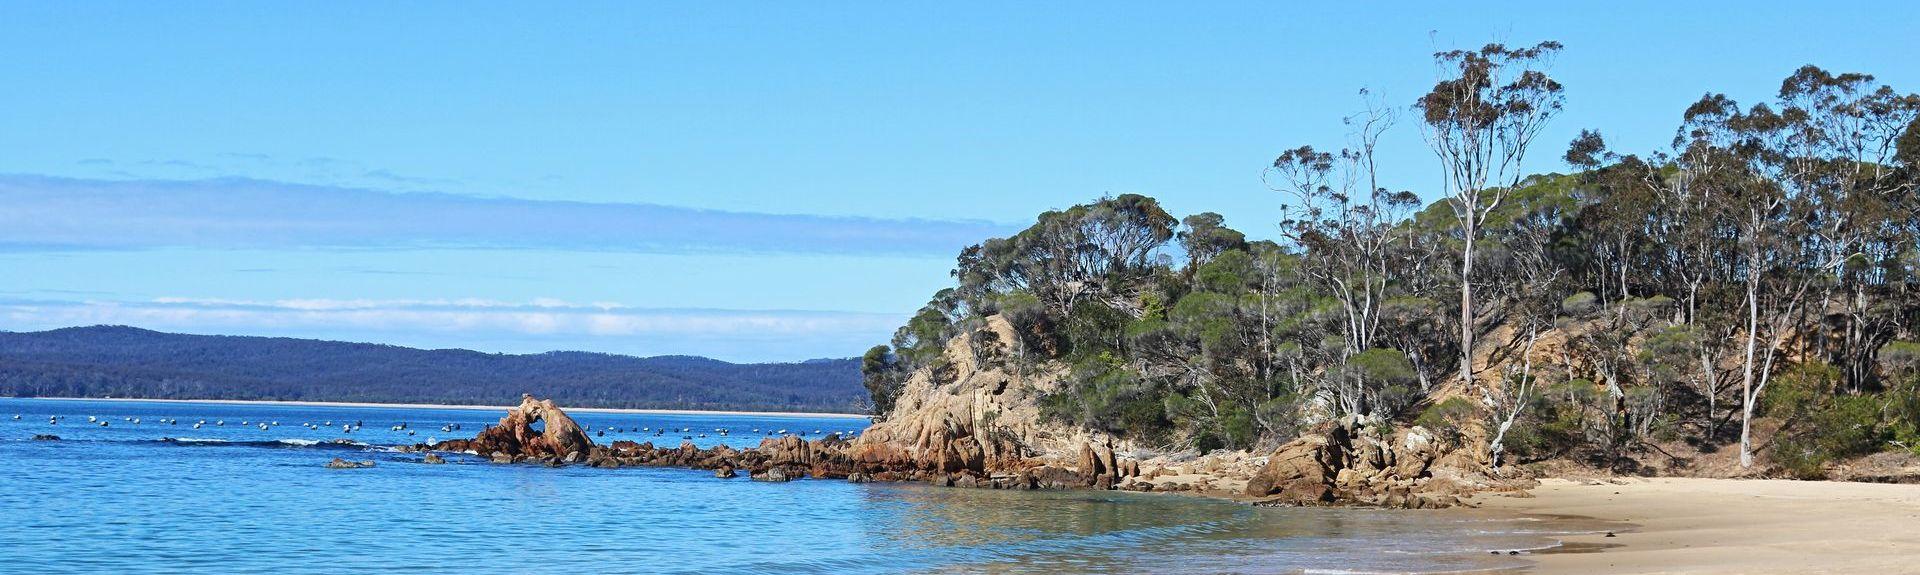 Potoroo Palace, Yellow Pinch, New South Wales, Australia